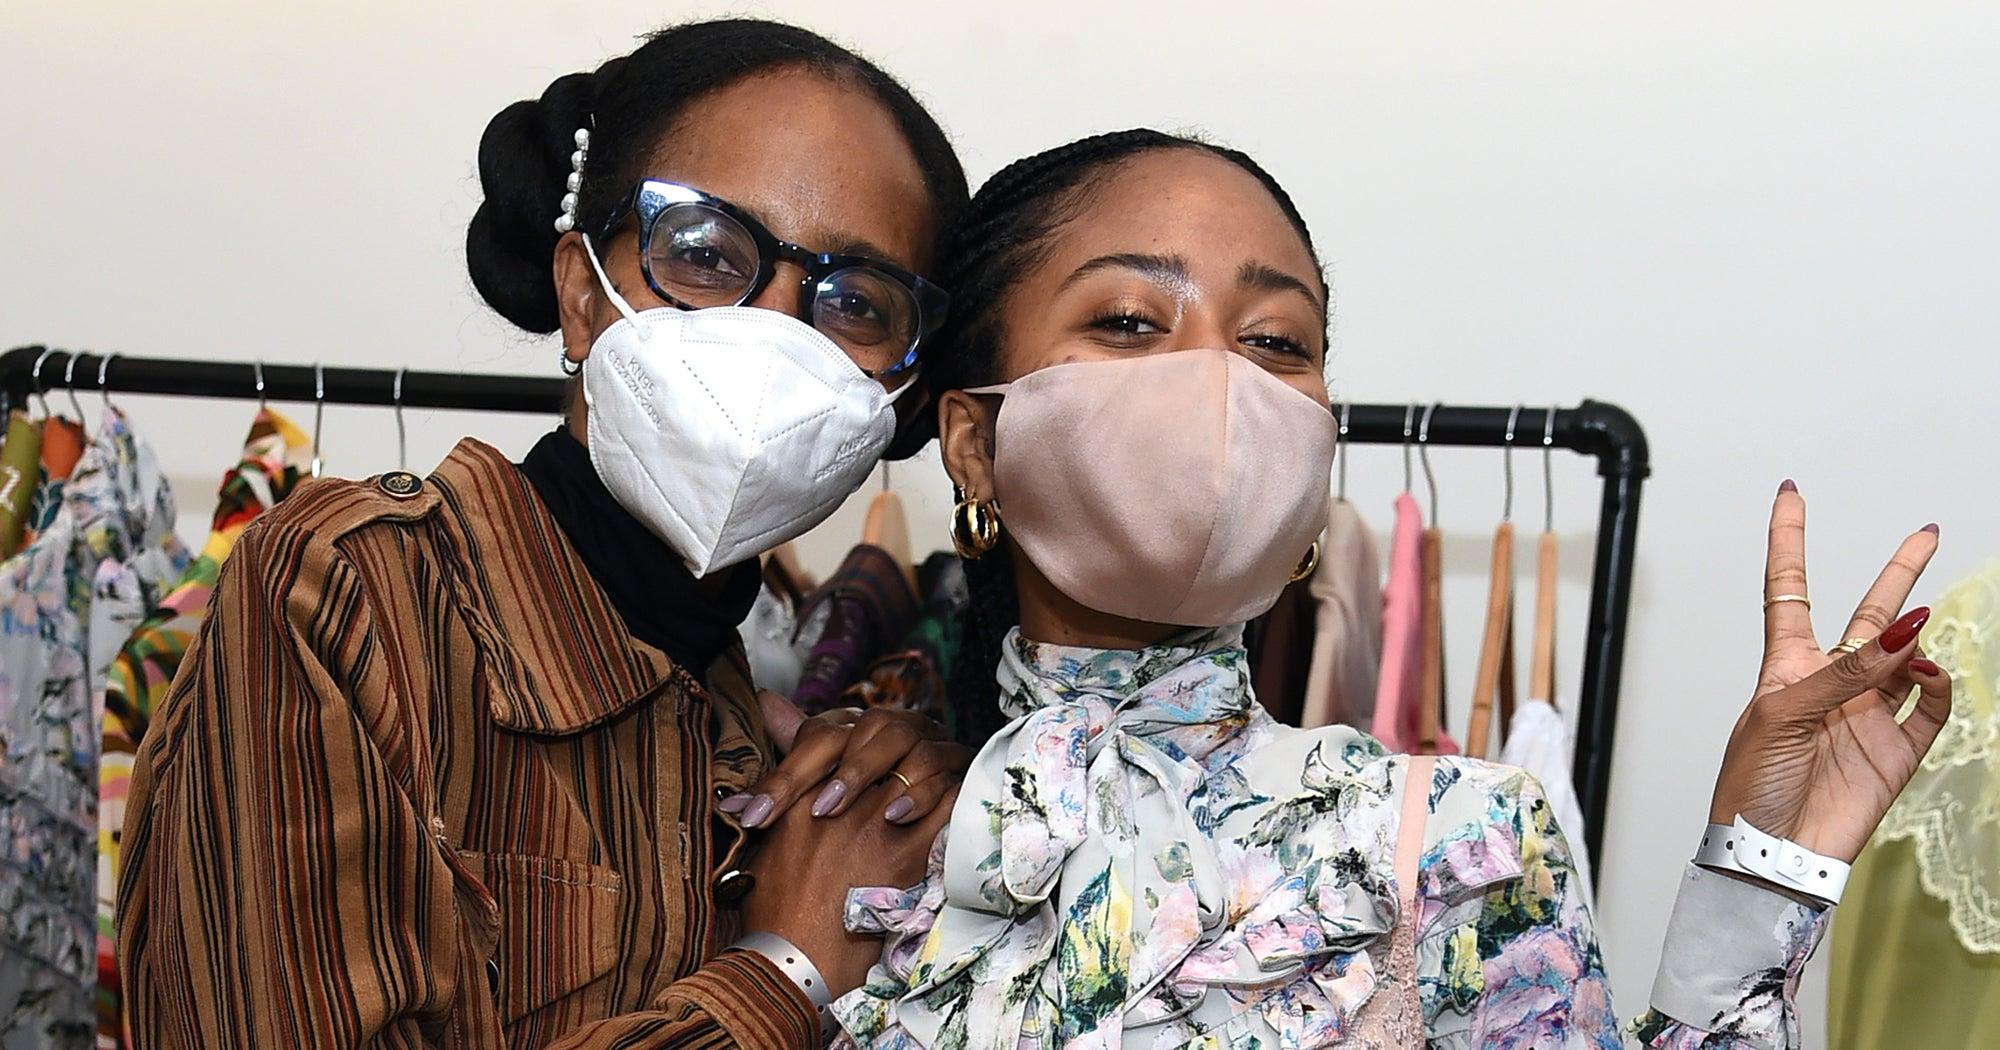 BIFC Hosts NYFW Showcase For Black Fashion Designers